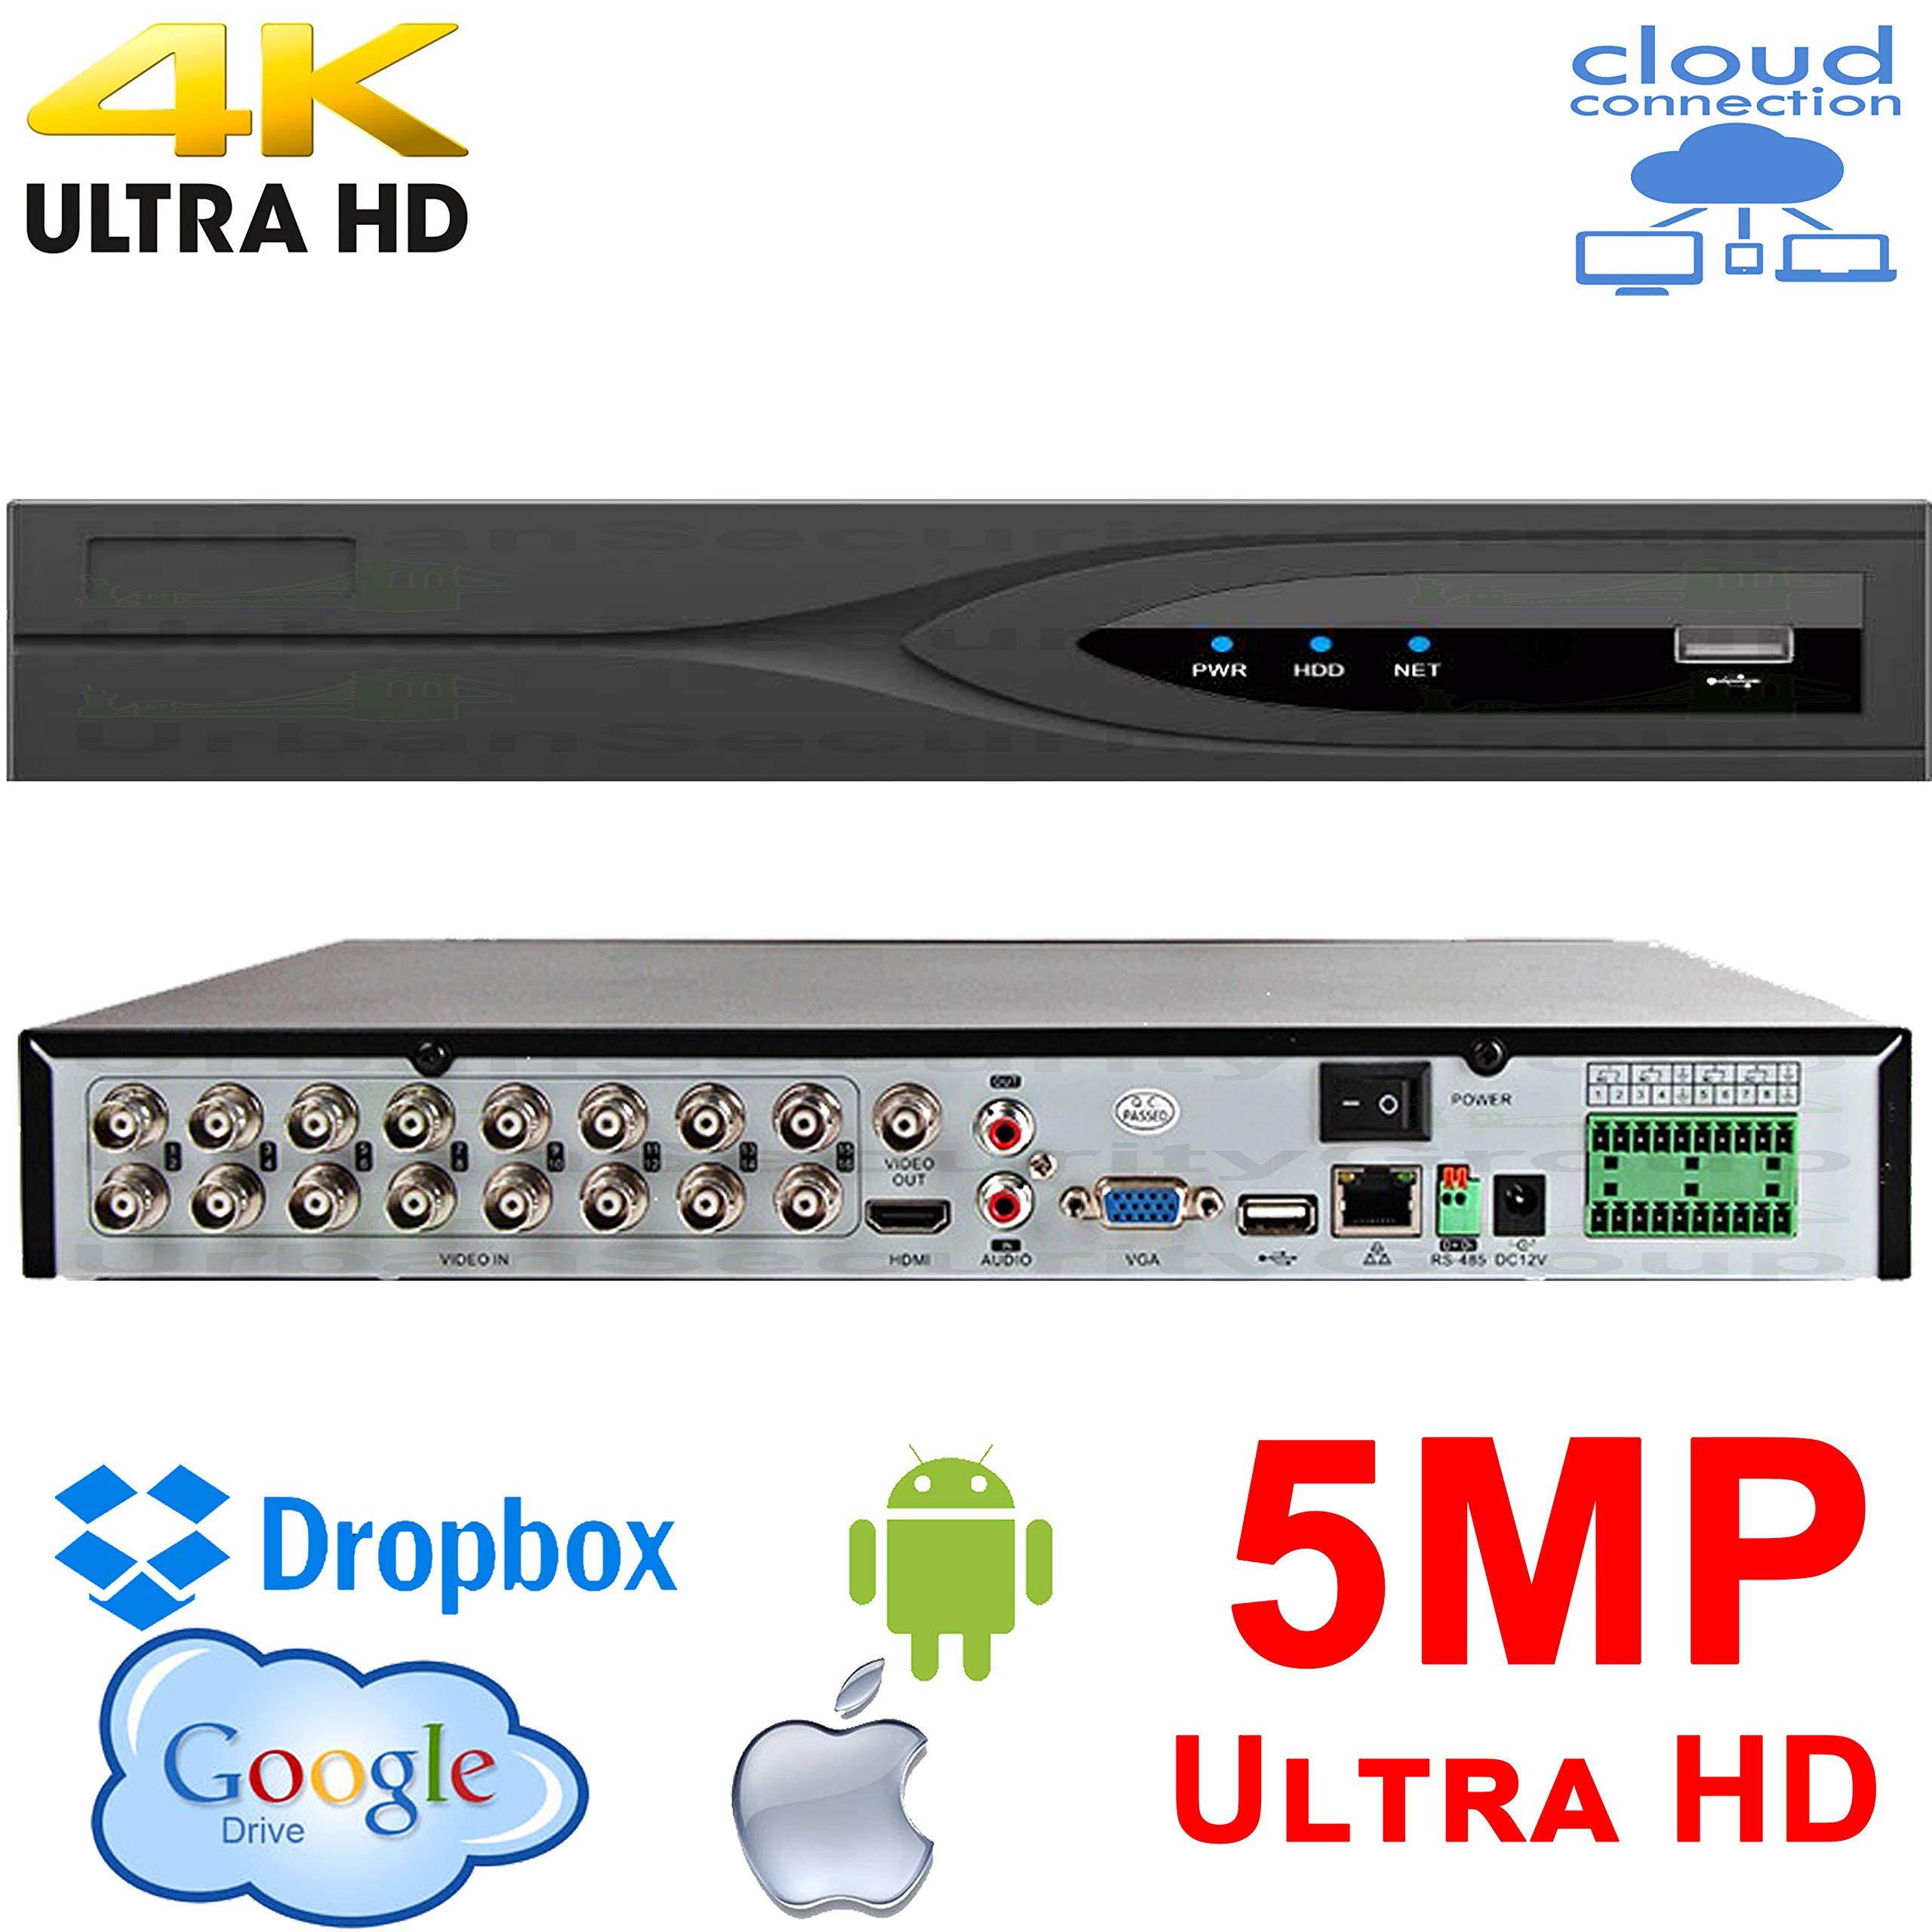 USG Business Grade 16 Channel 5MP 2MP HD-TVI, HD-CVI, AHD, Analog, IP Security Video Recorder DVR + 4TB HDD : 16x BNC, 2X SATA, Ultra 4K HDMI, VGA, BNC, RS485, Audio, Cloud, Plug Play, Free Phone App